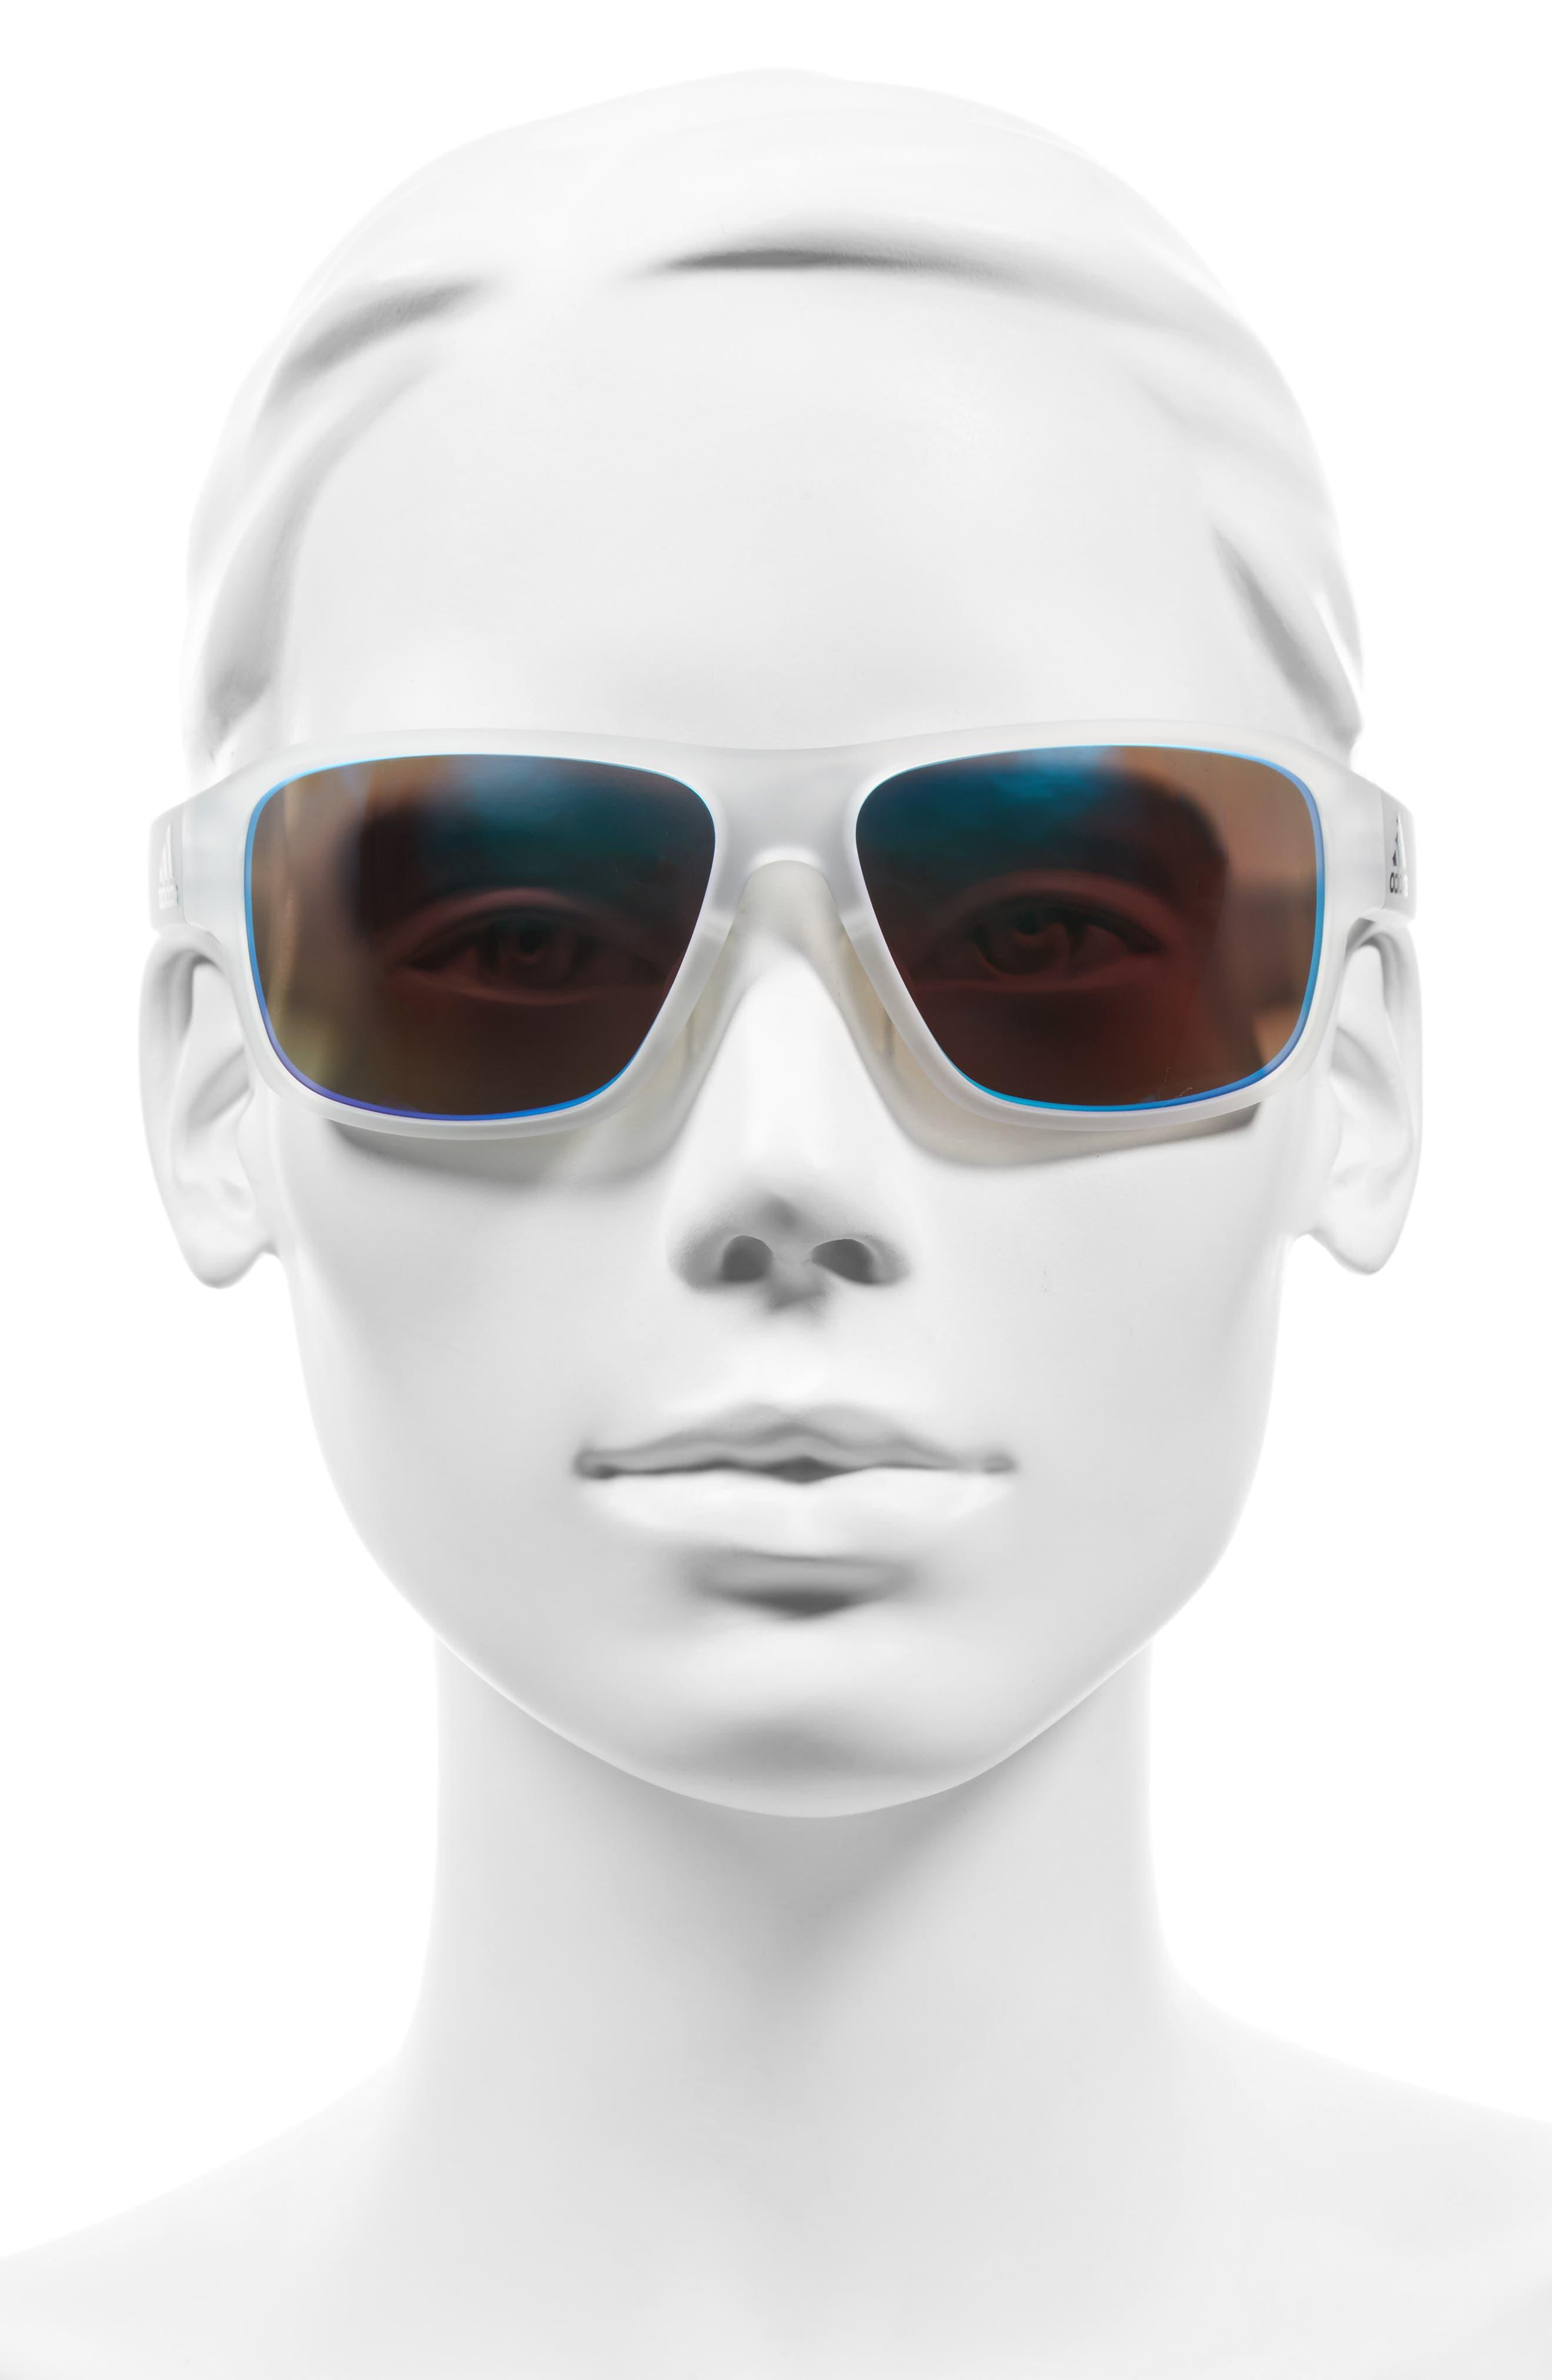 Jaysor 60mm Sunglasses,                             Alternate thumbnail 2, color,                             Crystal Clear/ Blue Mirror